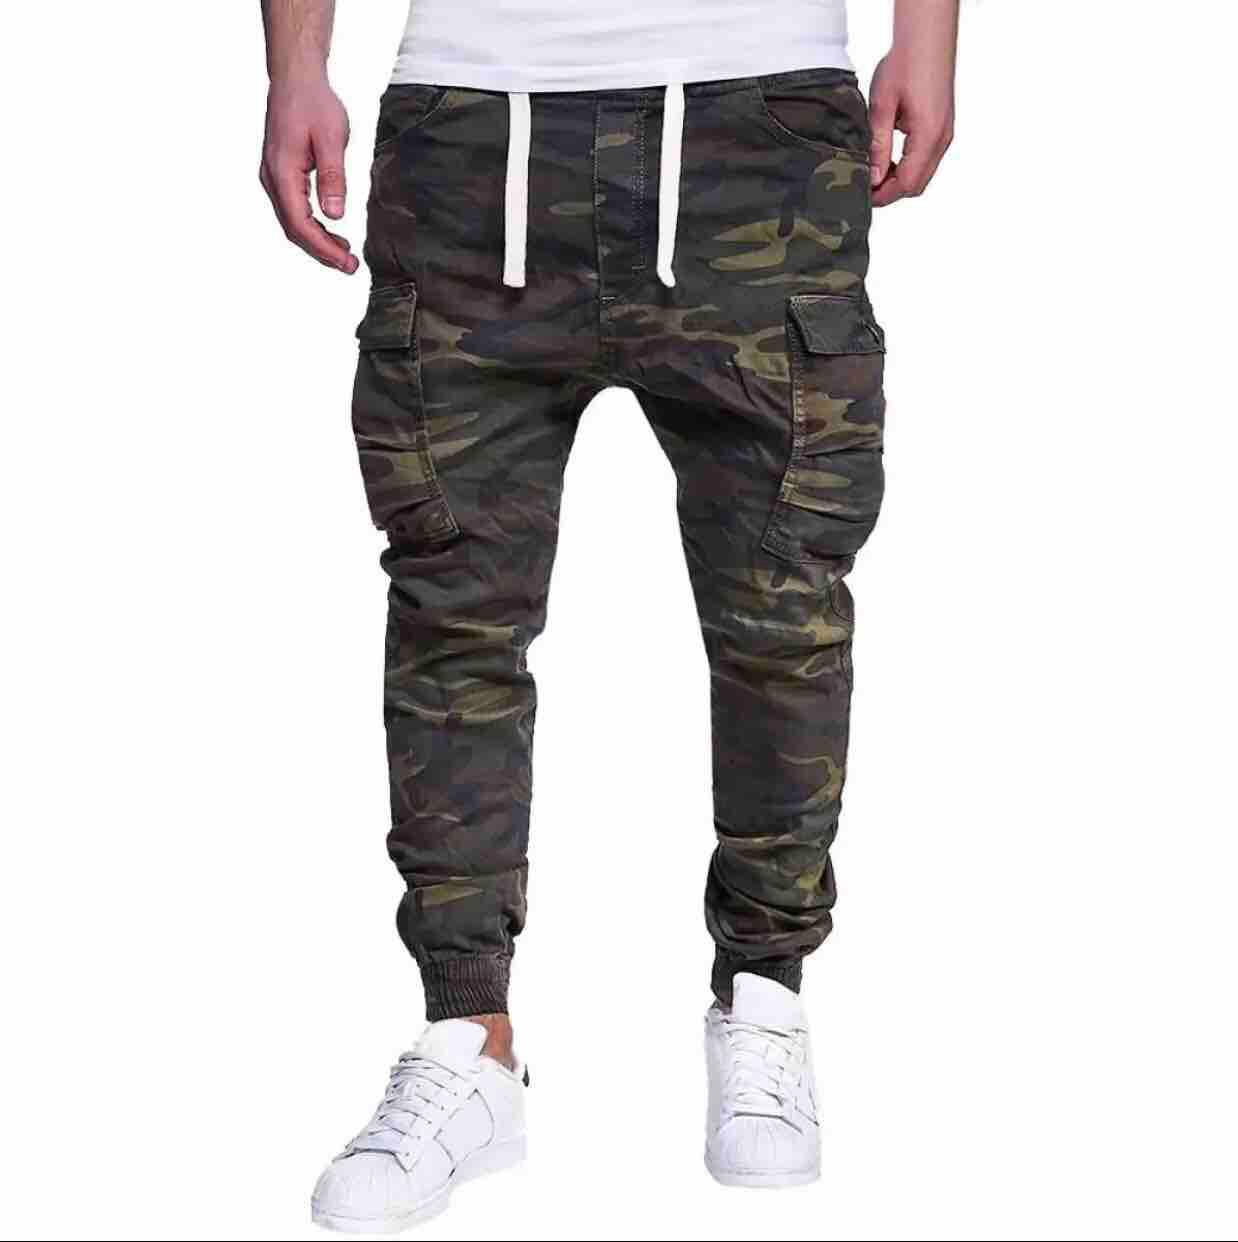 Style Jogger Pants 6pocket Mens By Vs Fashion.